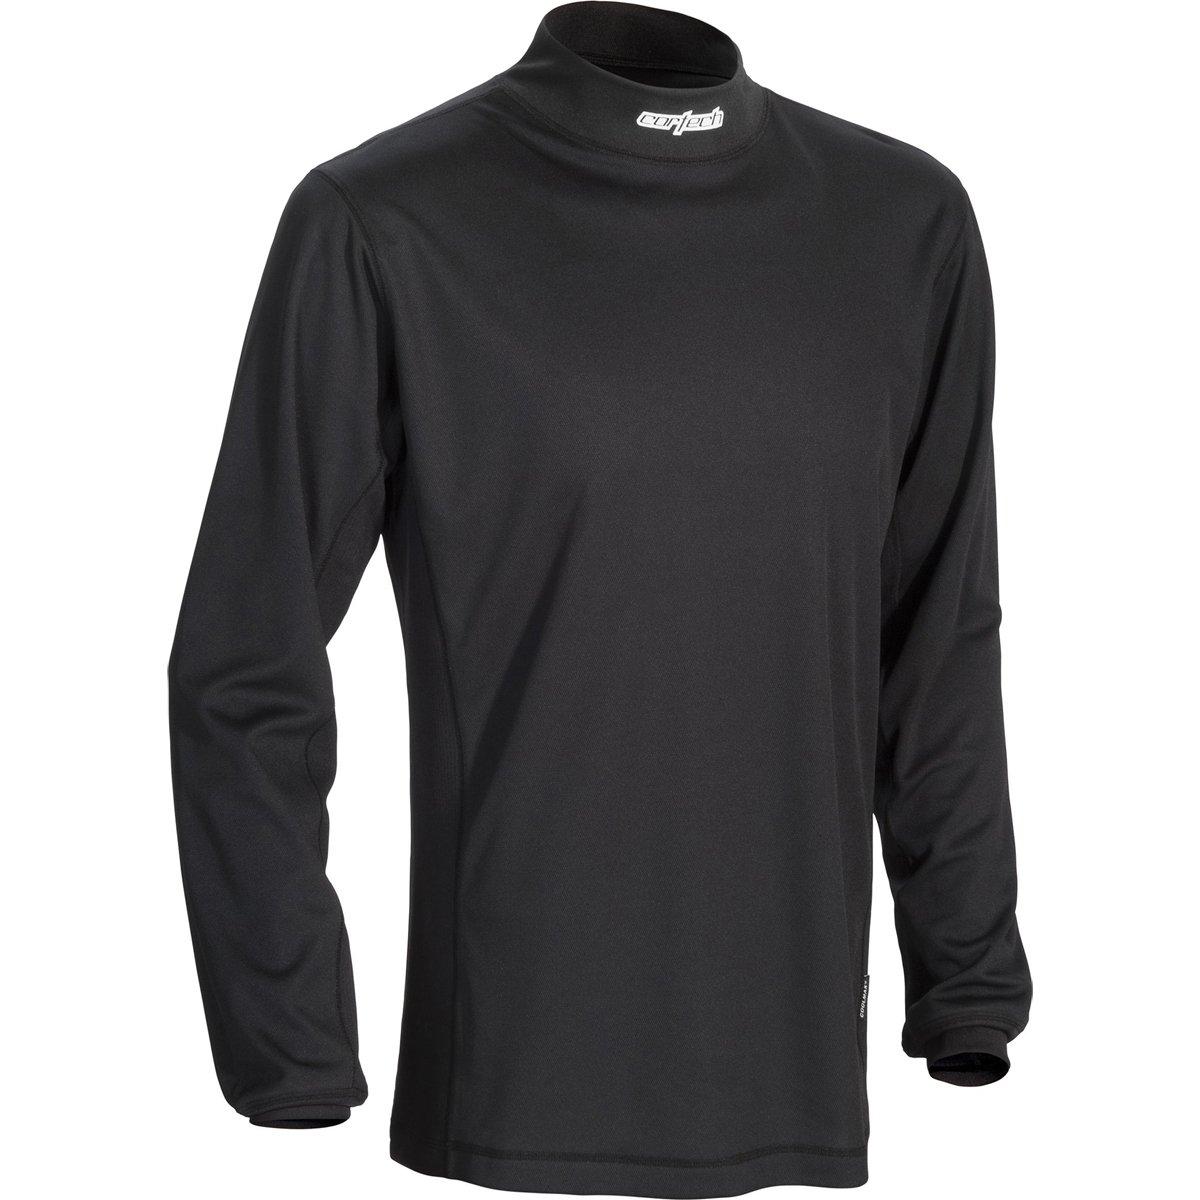 Cortech Journey Coolmax Mock Long-Sleeve Crew Neck Shirt Base Layer Men's Undergarment Snow Body Armor - Black/Large